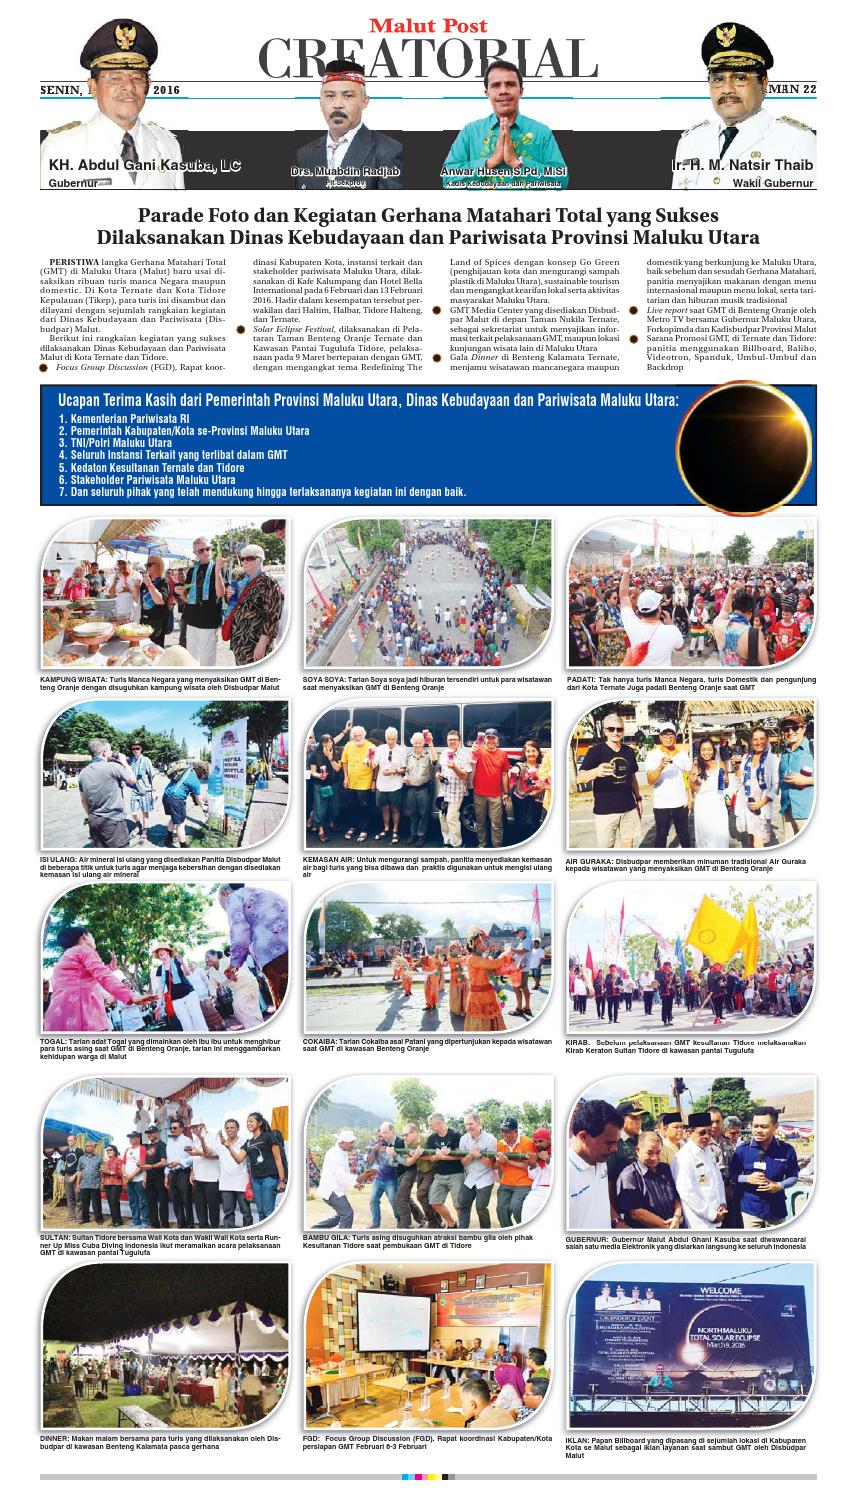 Malut Post 14 Maret 2016 By Malut Post Issuu